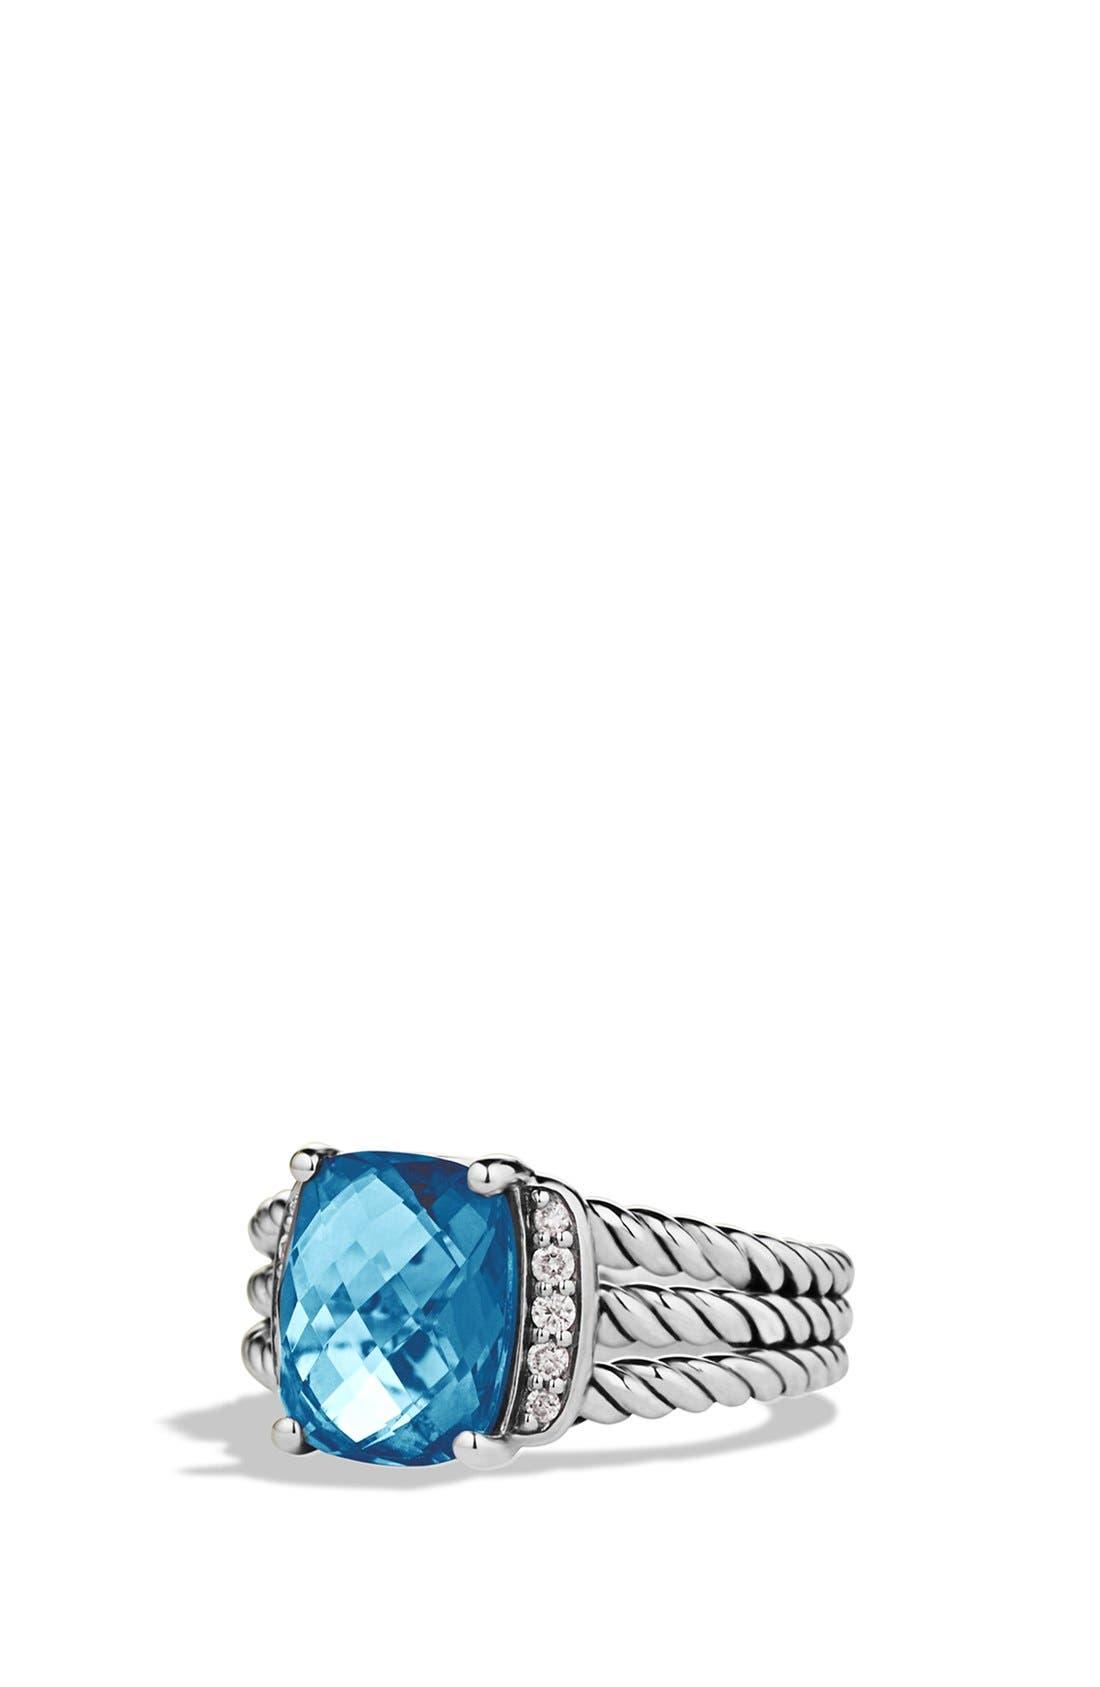 'Wheaton' Petite Ring with Semiprecious Stone & Diamonds,                         Main,                         color, Hampton Blue Topaz